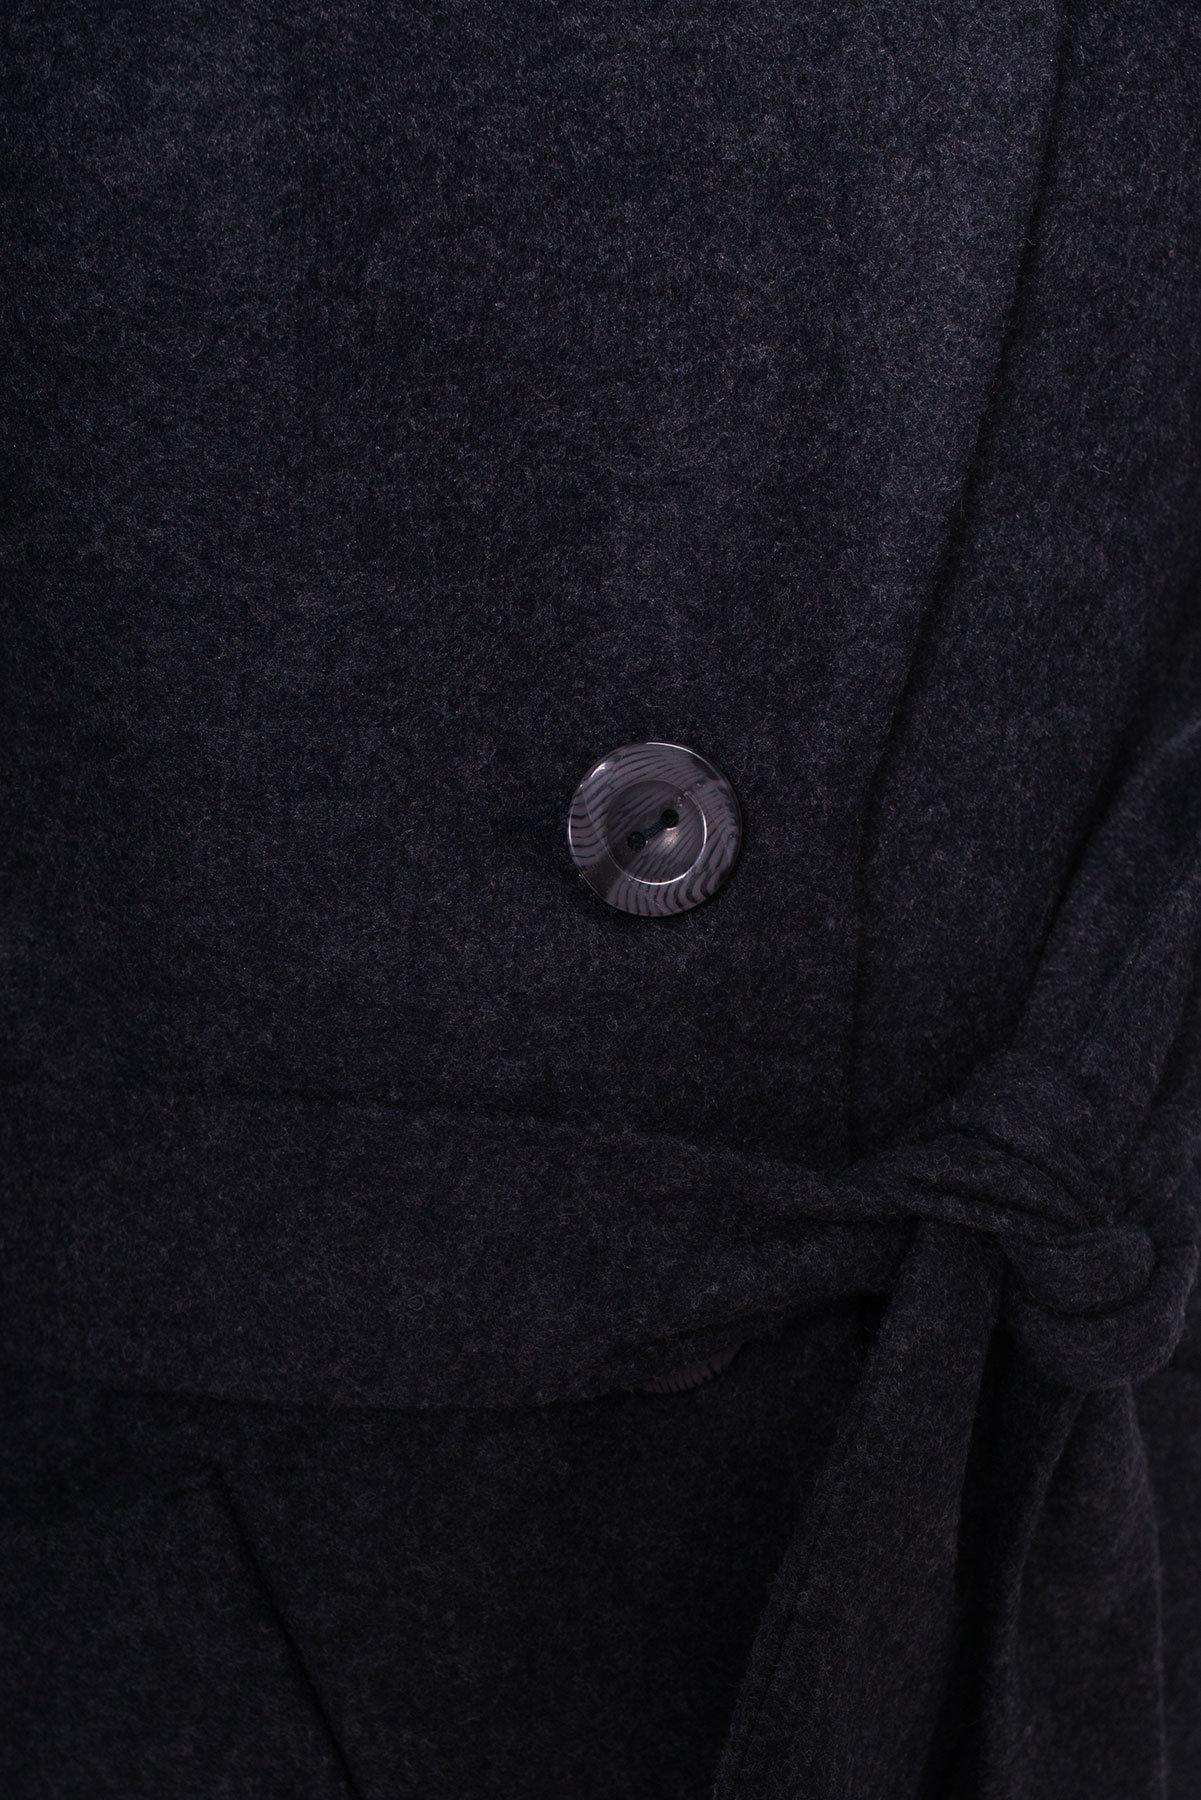 Пальто Габриэлла 4417 АРТ. 21337 Цвет: Темно-синий - фото 6, интернет магазин tm-modus.ru